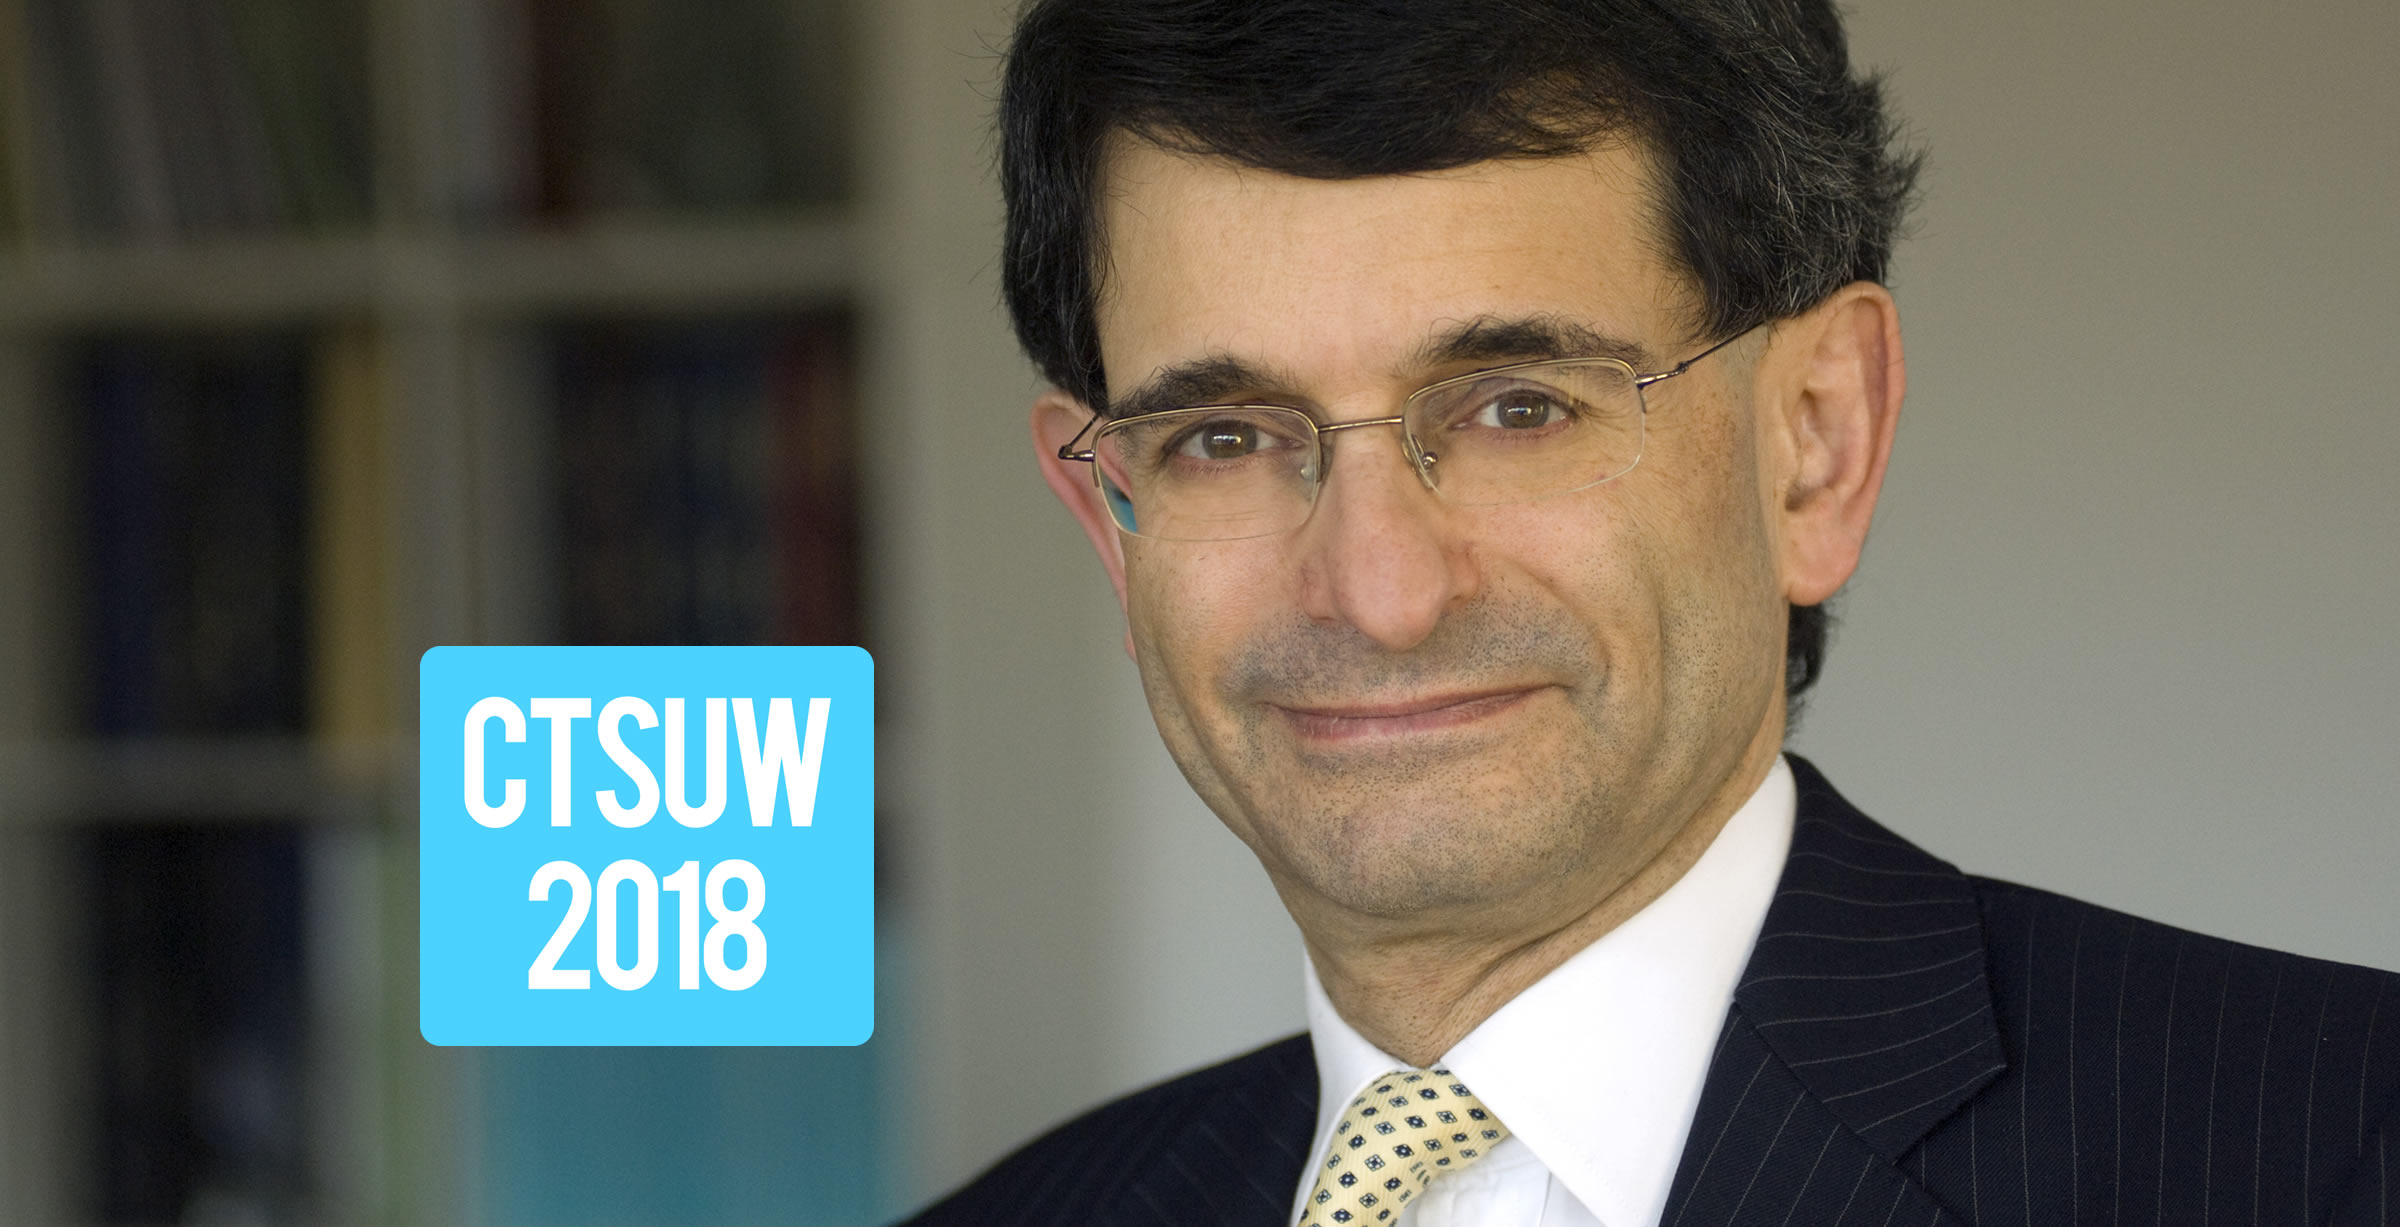 2018-CTSUW-EG-Prof-Colin-Mayer.jpg